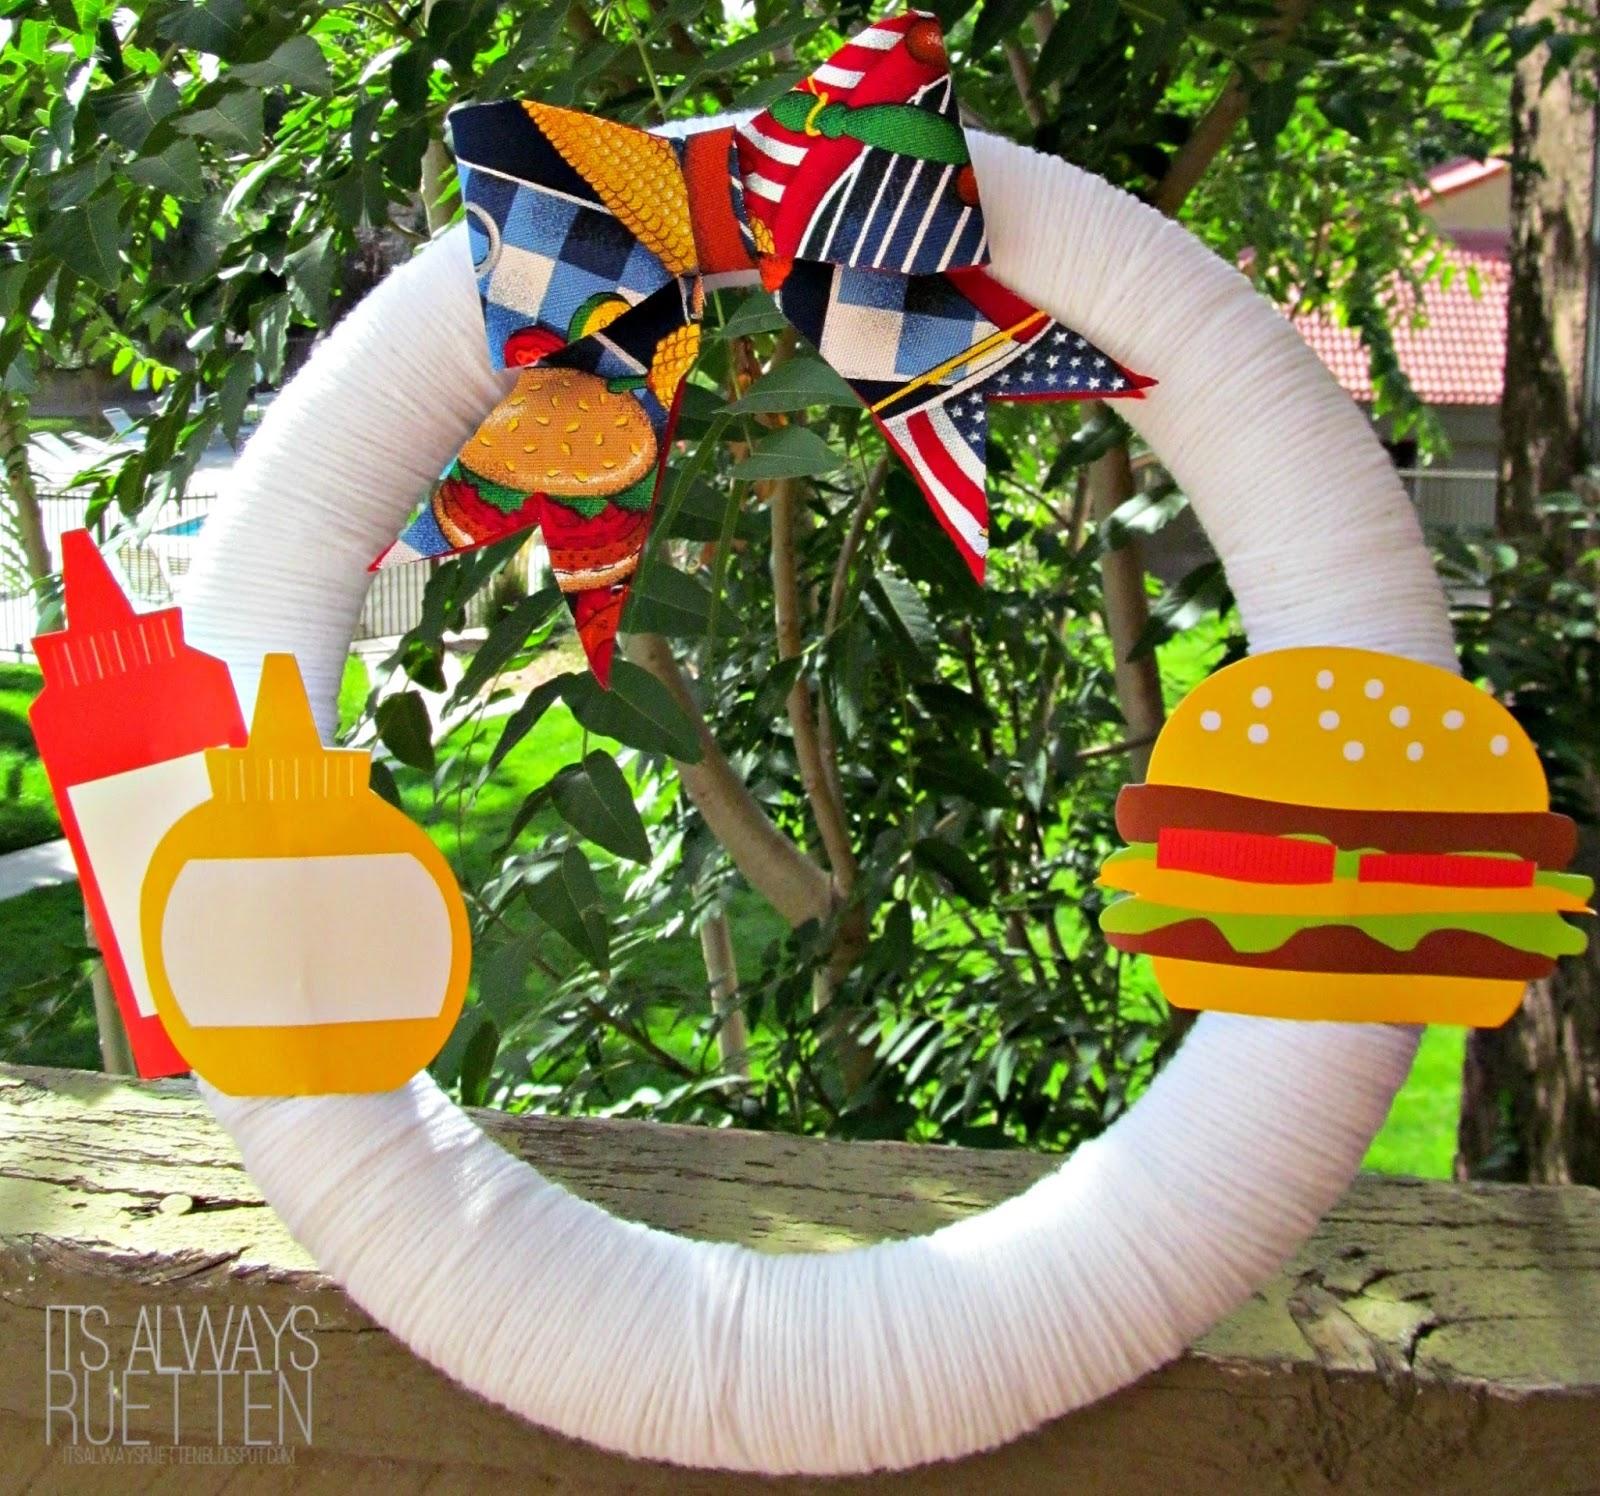 It 39 s always ruetten labor day wreath - Labor day decorating ideas ...